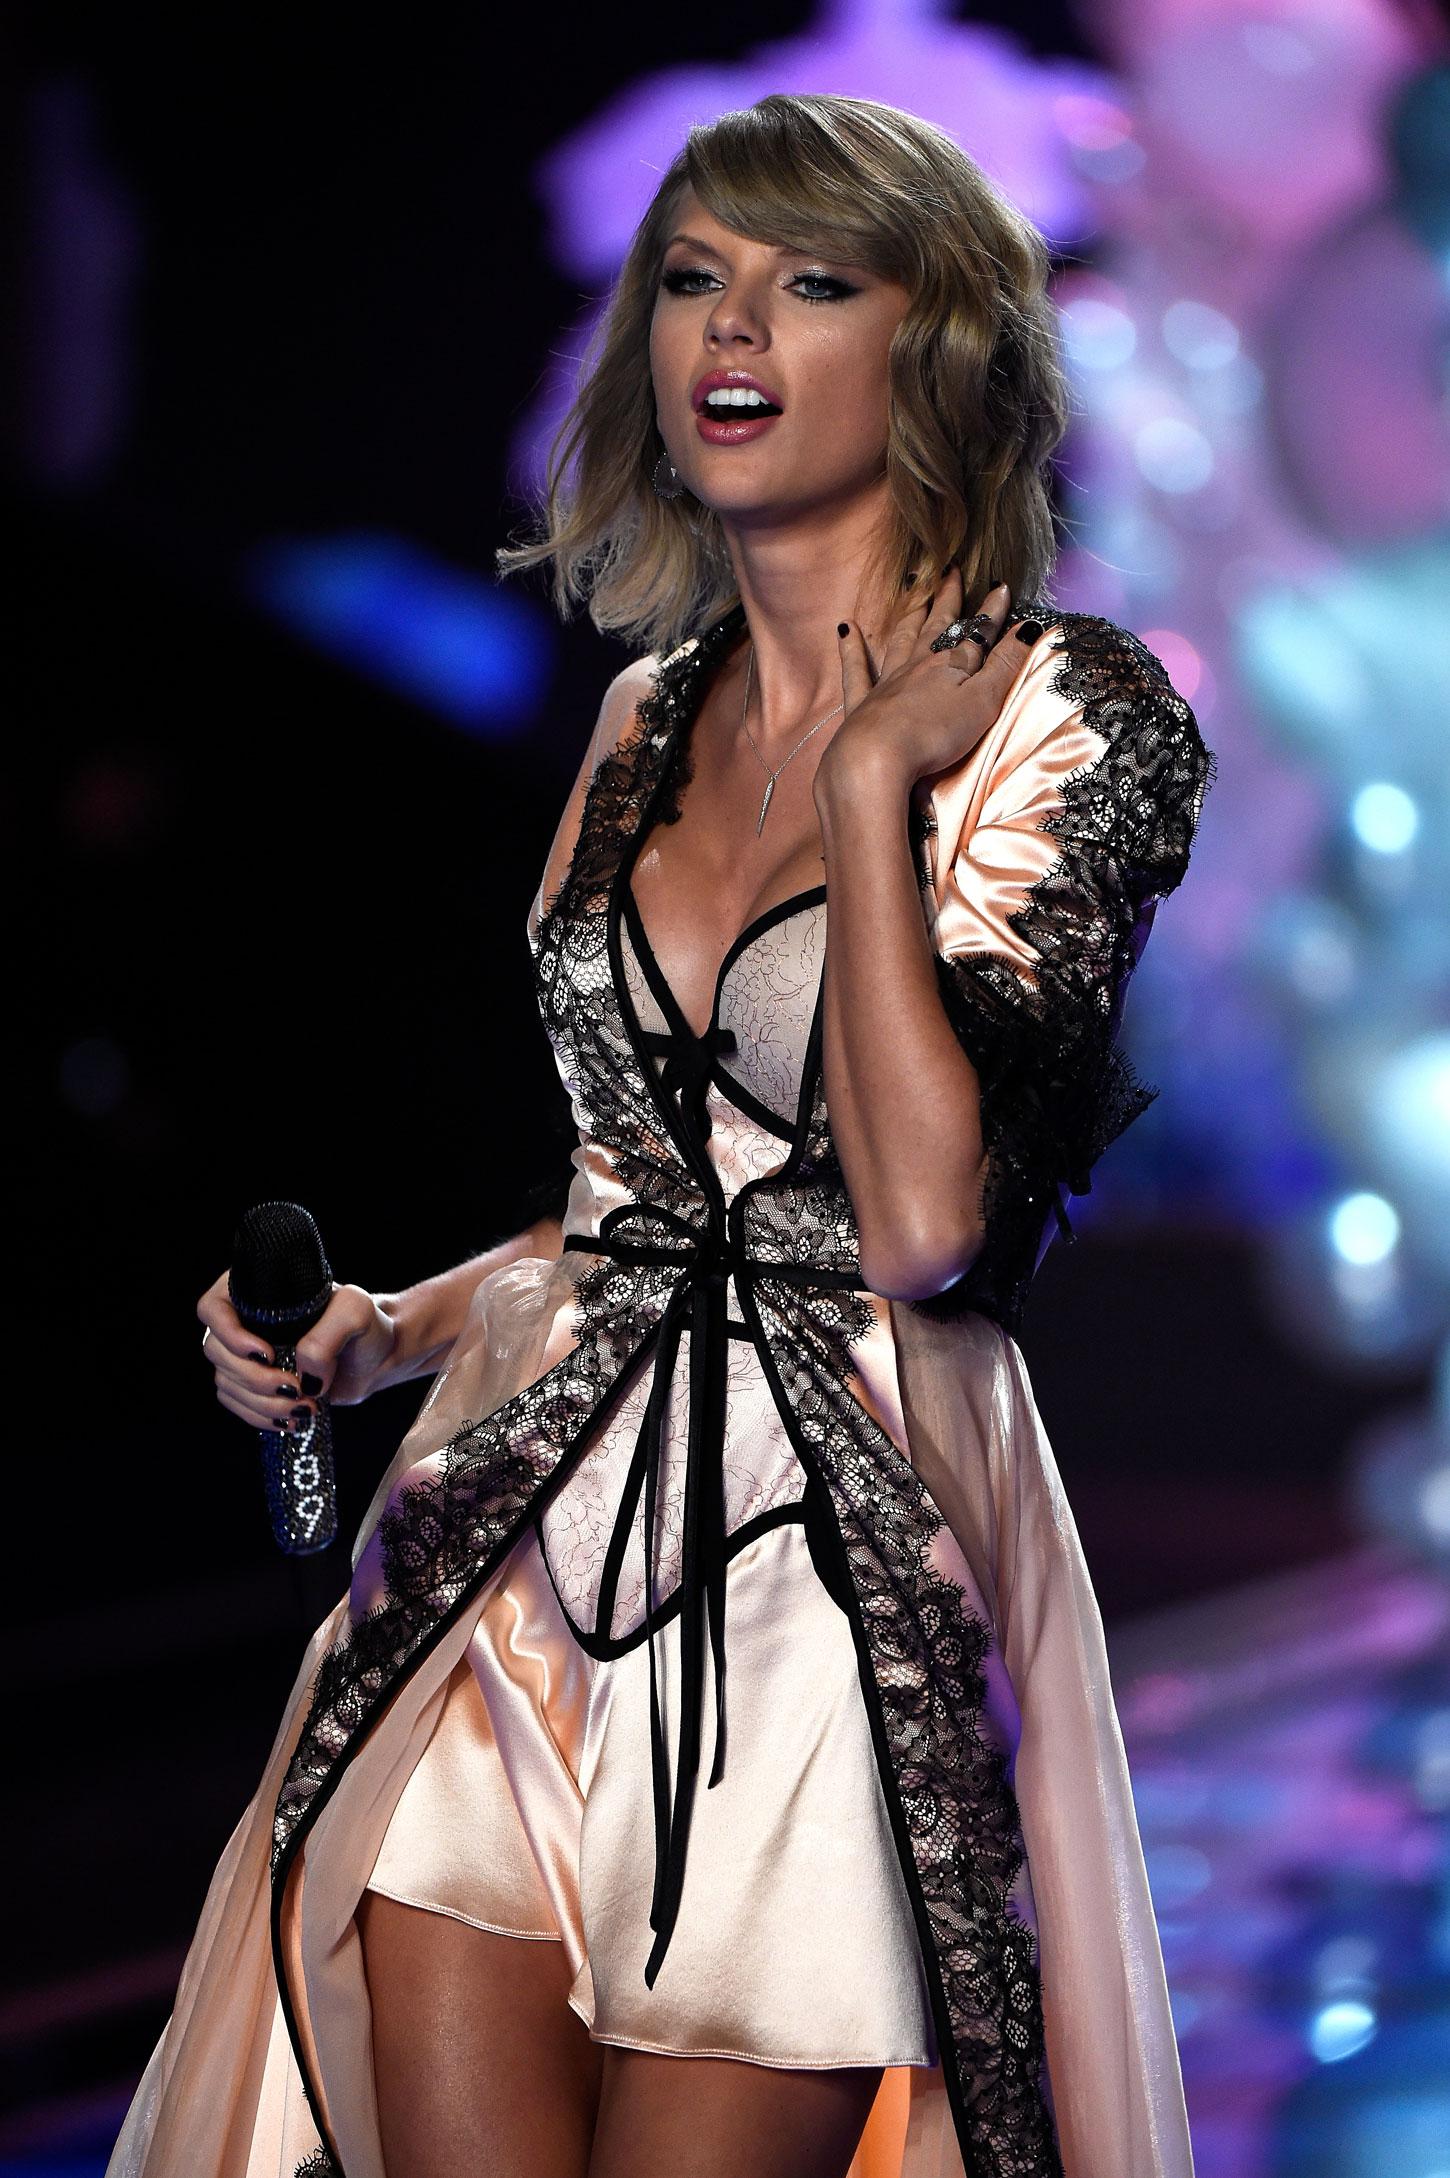 Taylor Swift 2014 : Taylor-Swift3